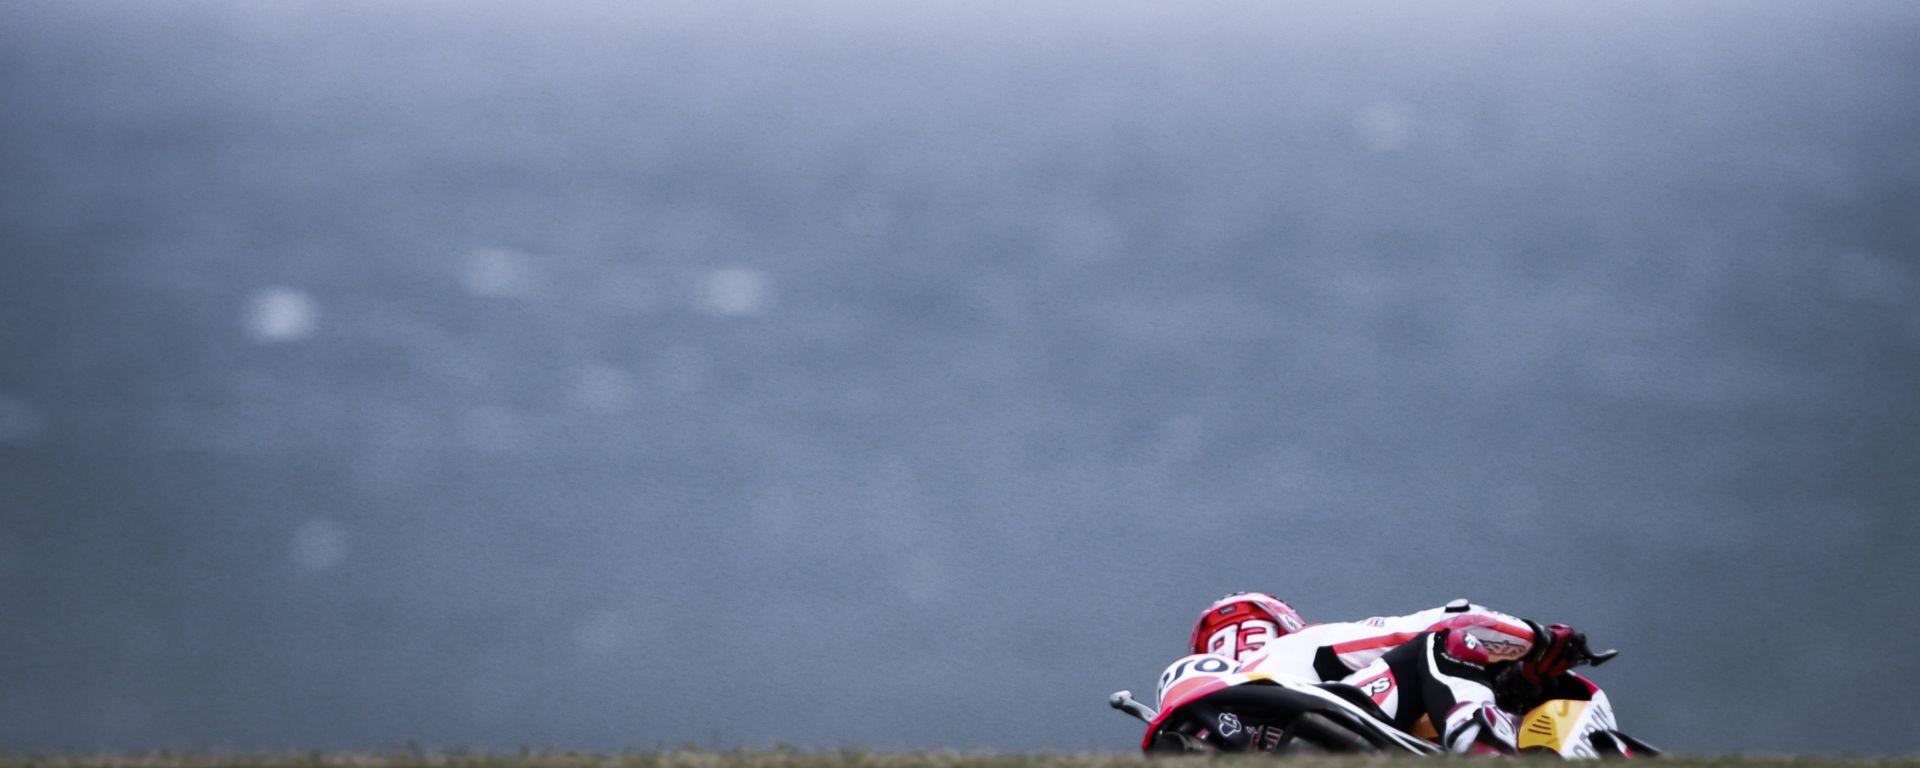 MotoGP Phillip Island 2016: Marquez in Pole, in crisi le Yamaha ufficiali